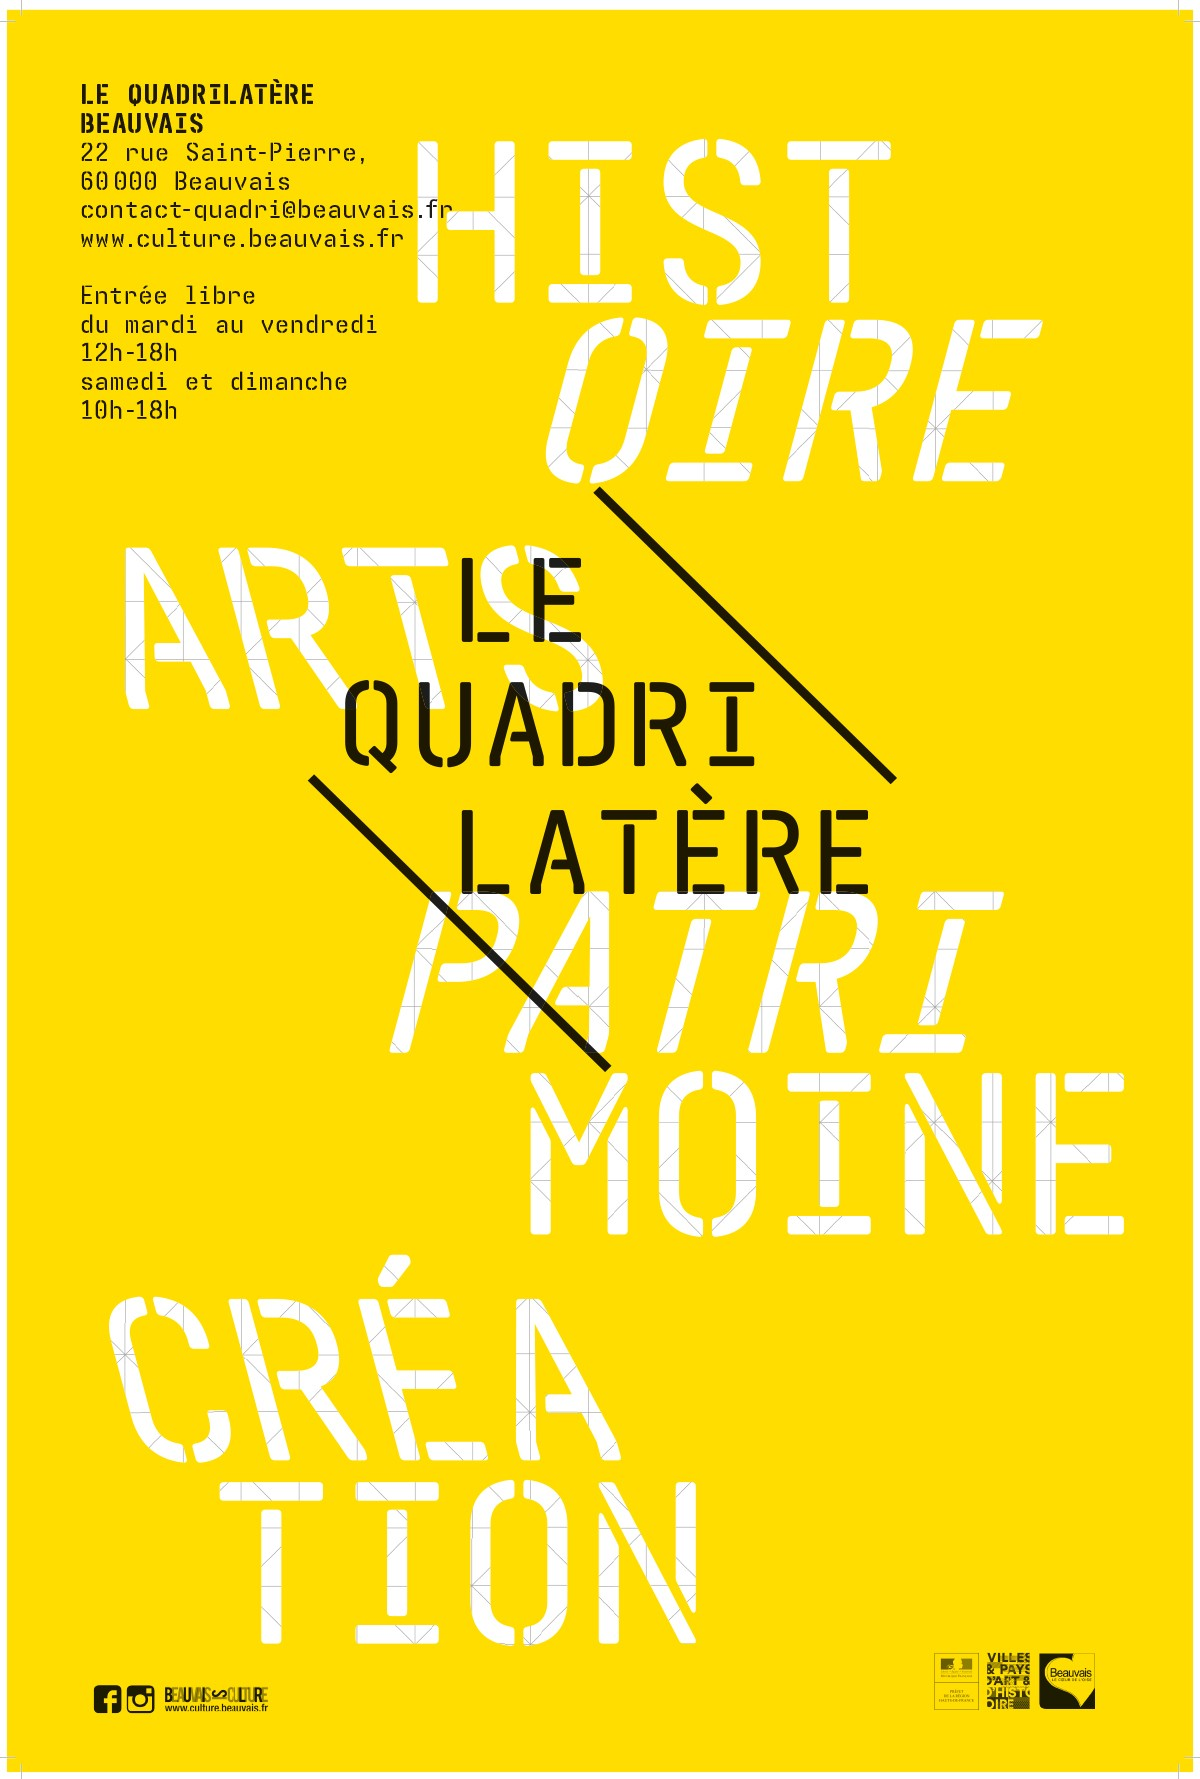 quadrilatere-histoire-arts-patrimoine-creation